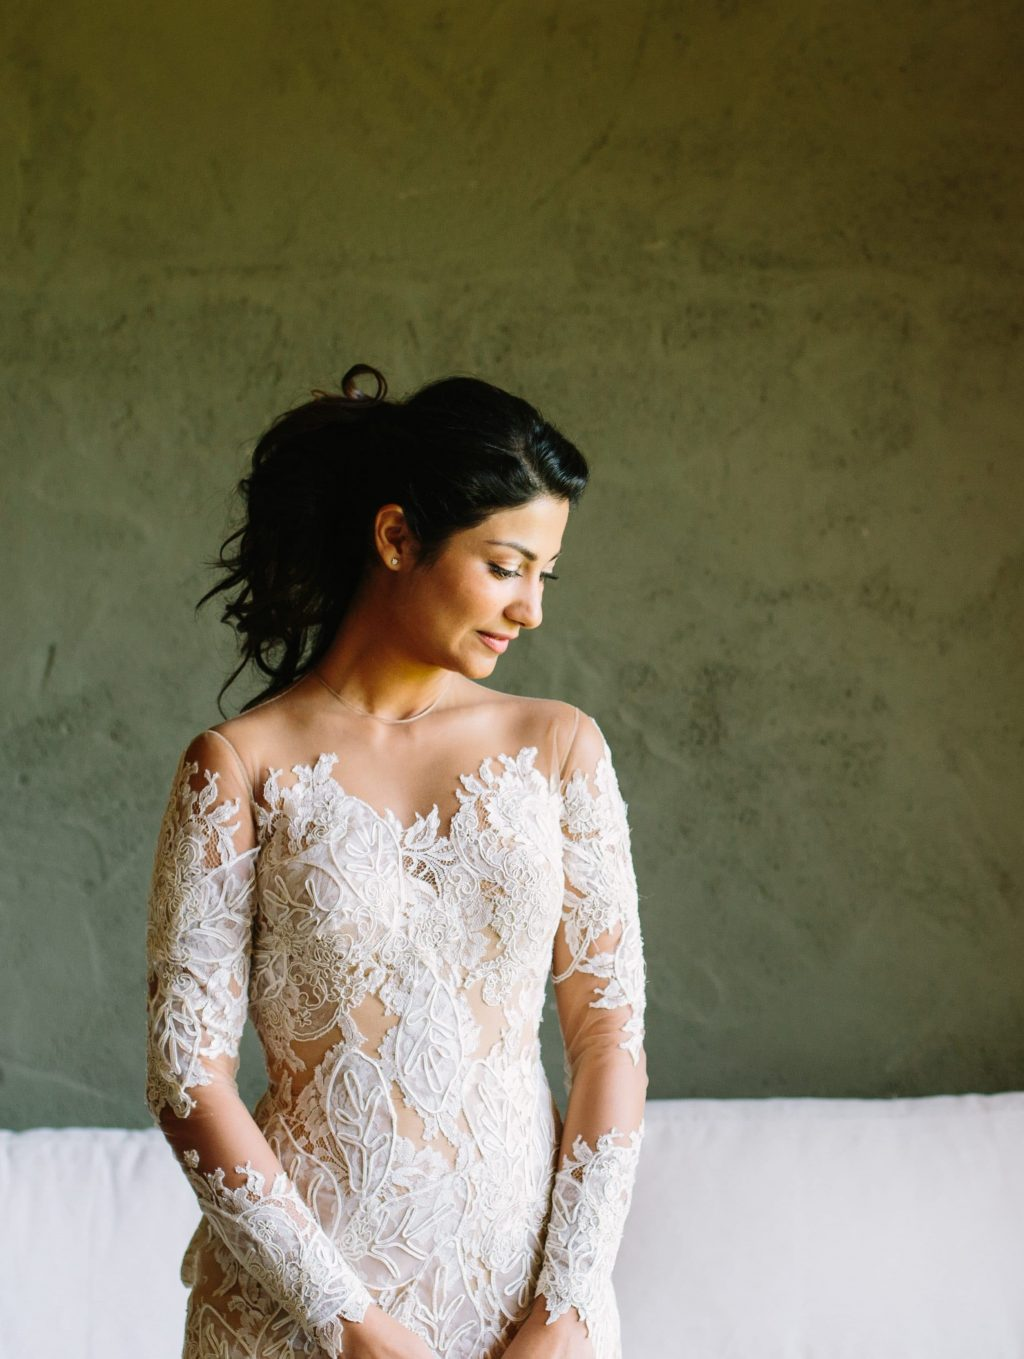 Wedding photographer Bride portrait